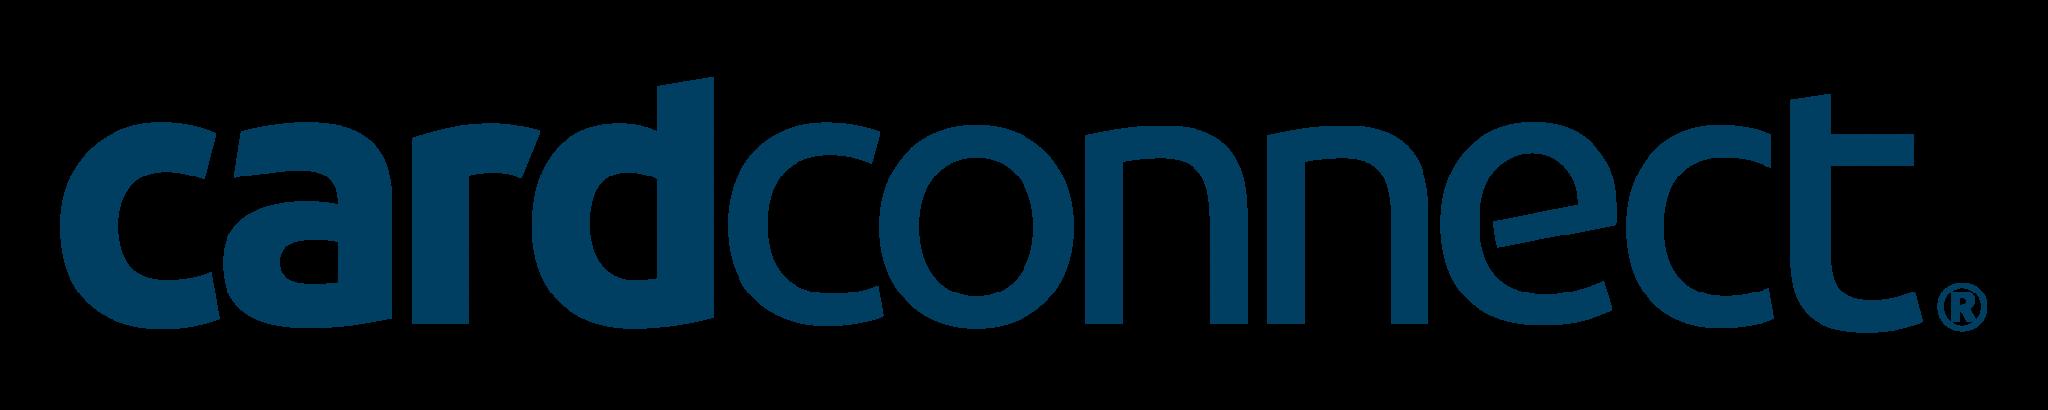 cardconnect logo (1)